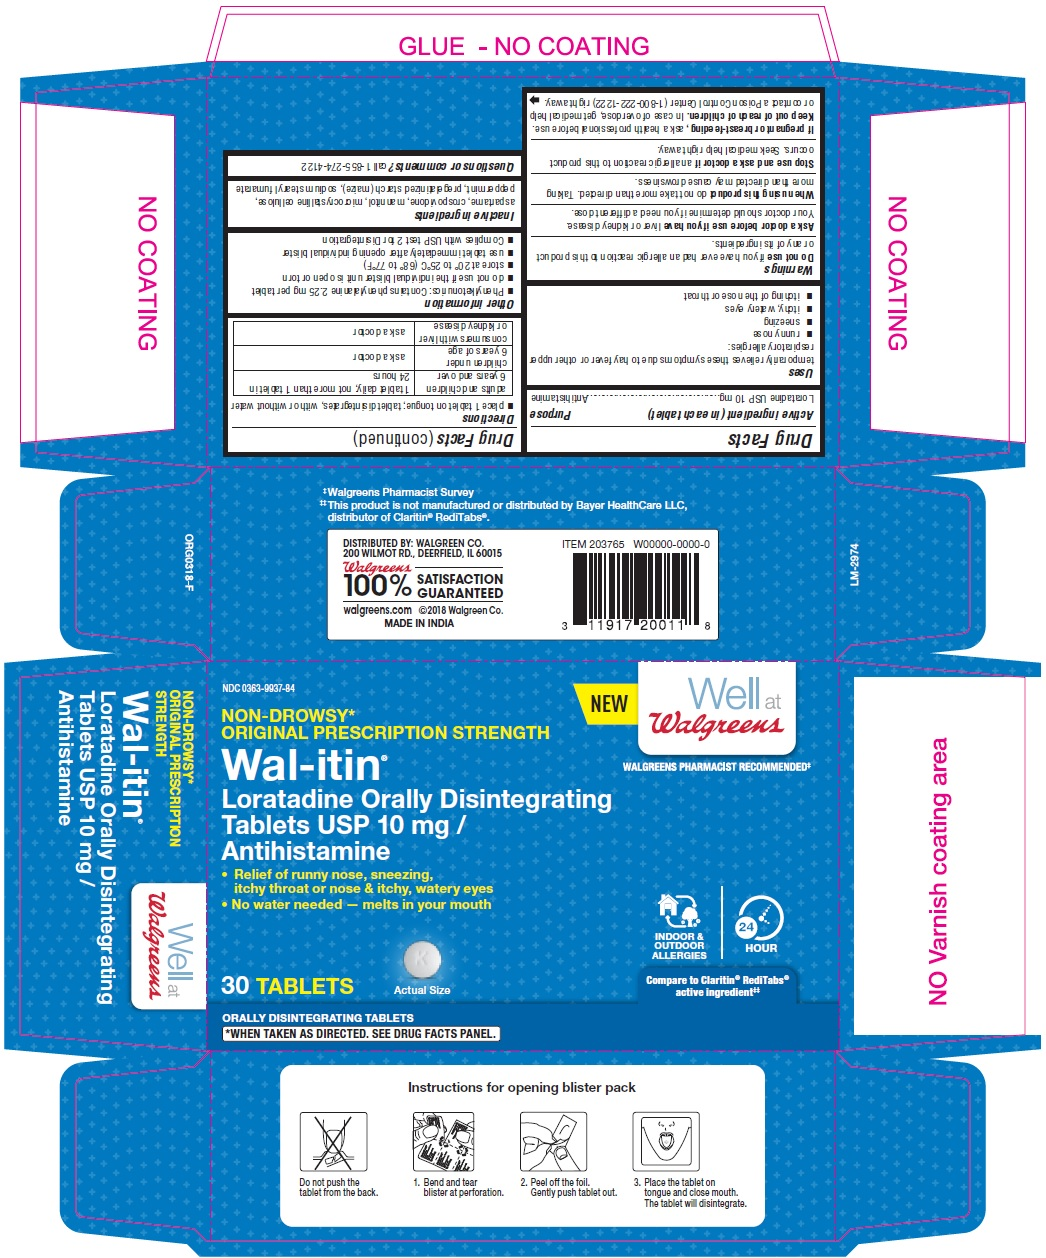 PACKAGE LABEL-PRINCIPAL DISPLAY PANEL - 10 mg, Blister Carton 30 (3 x 10) Orally Disintegrating Tablets